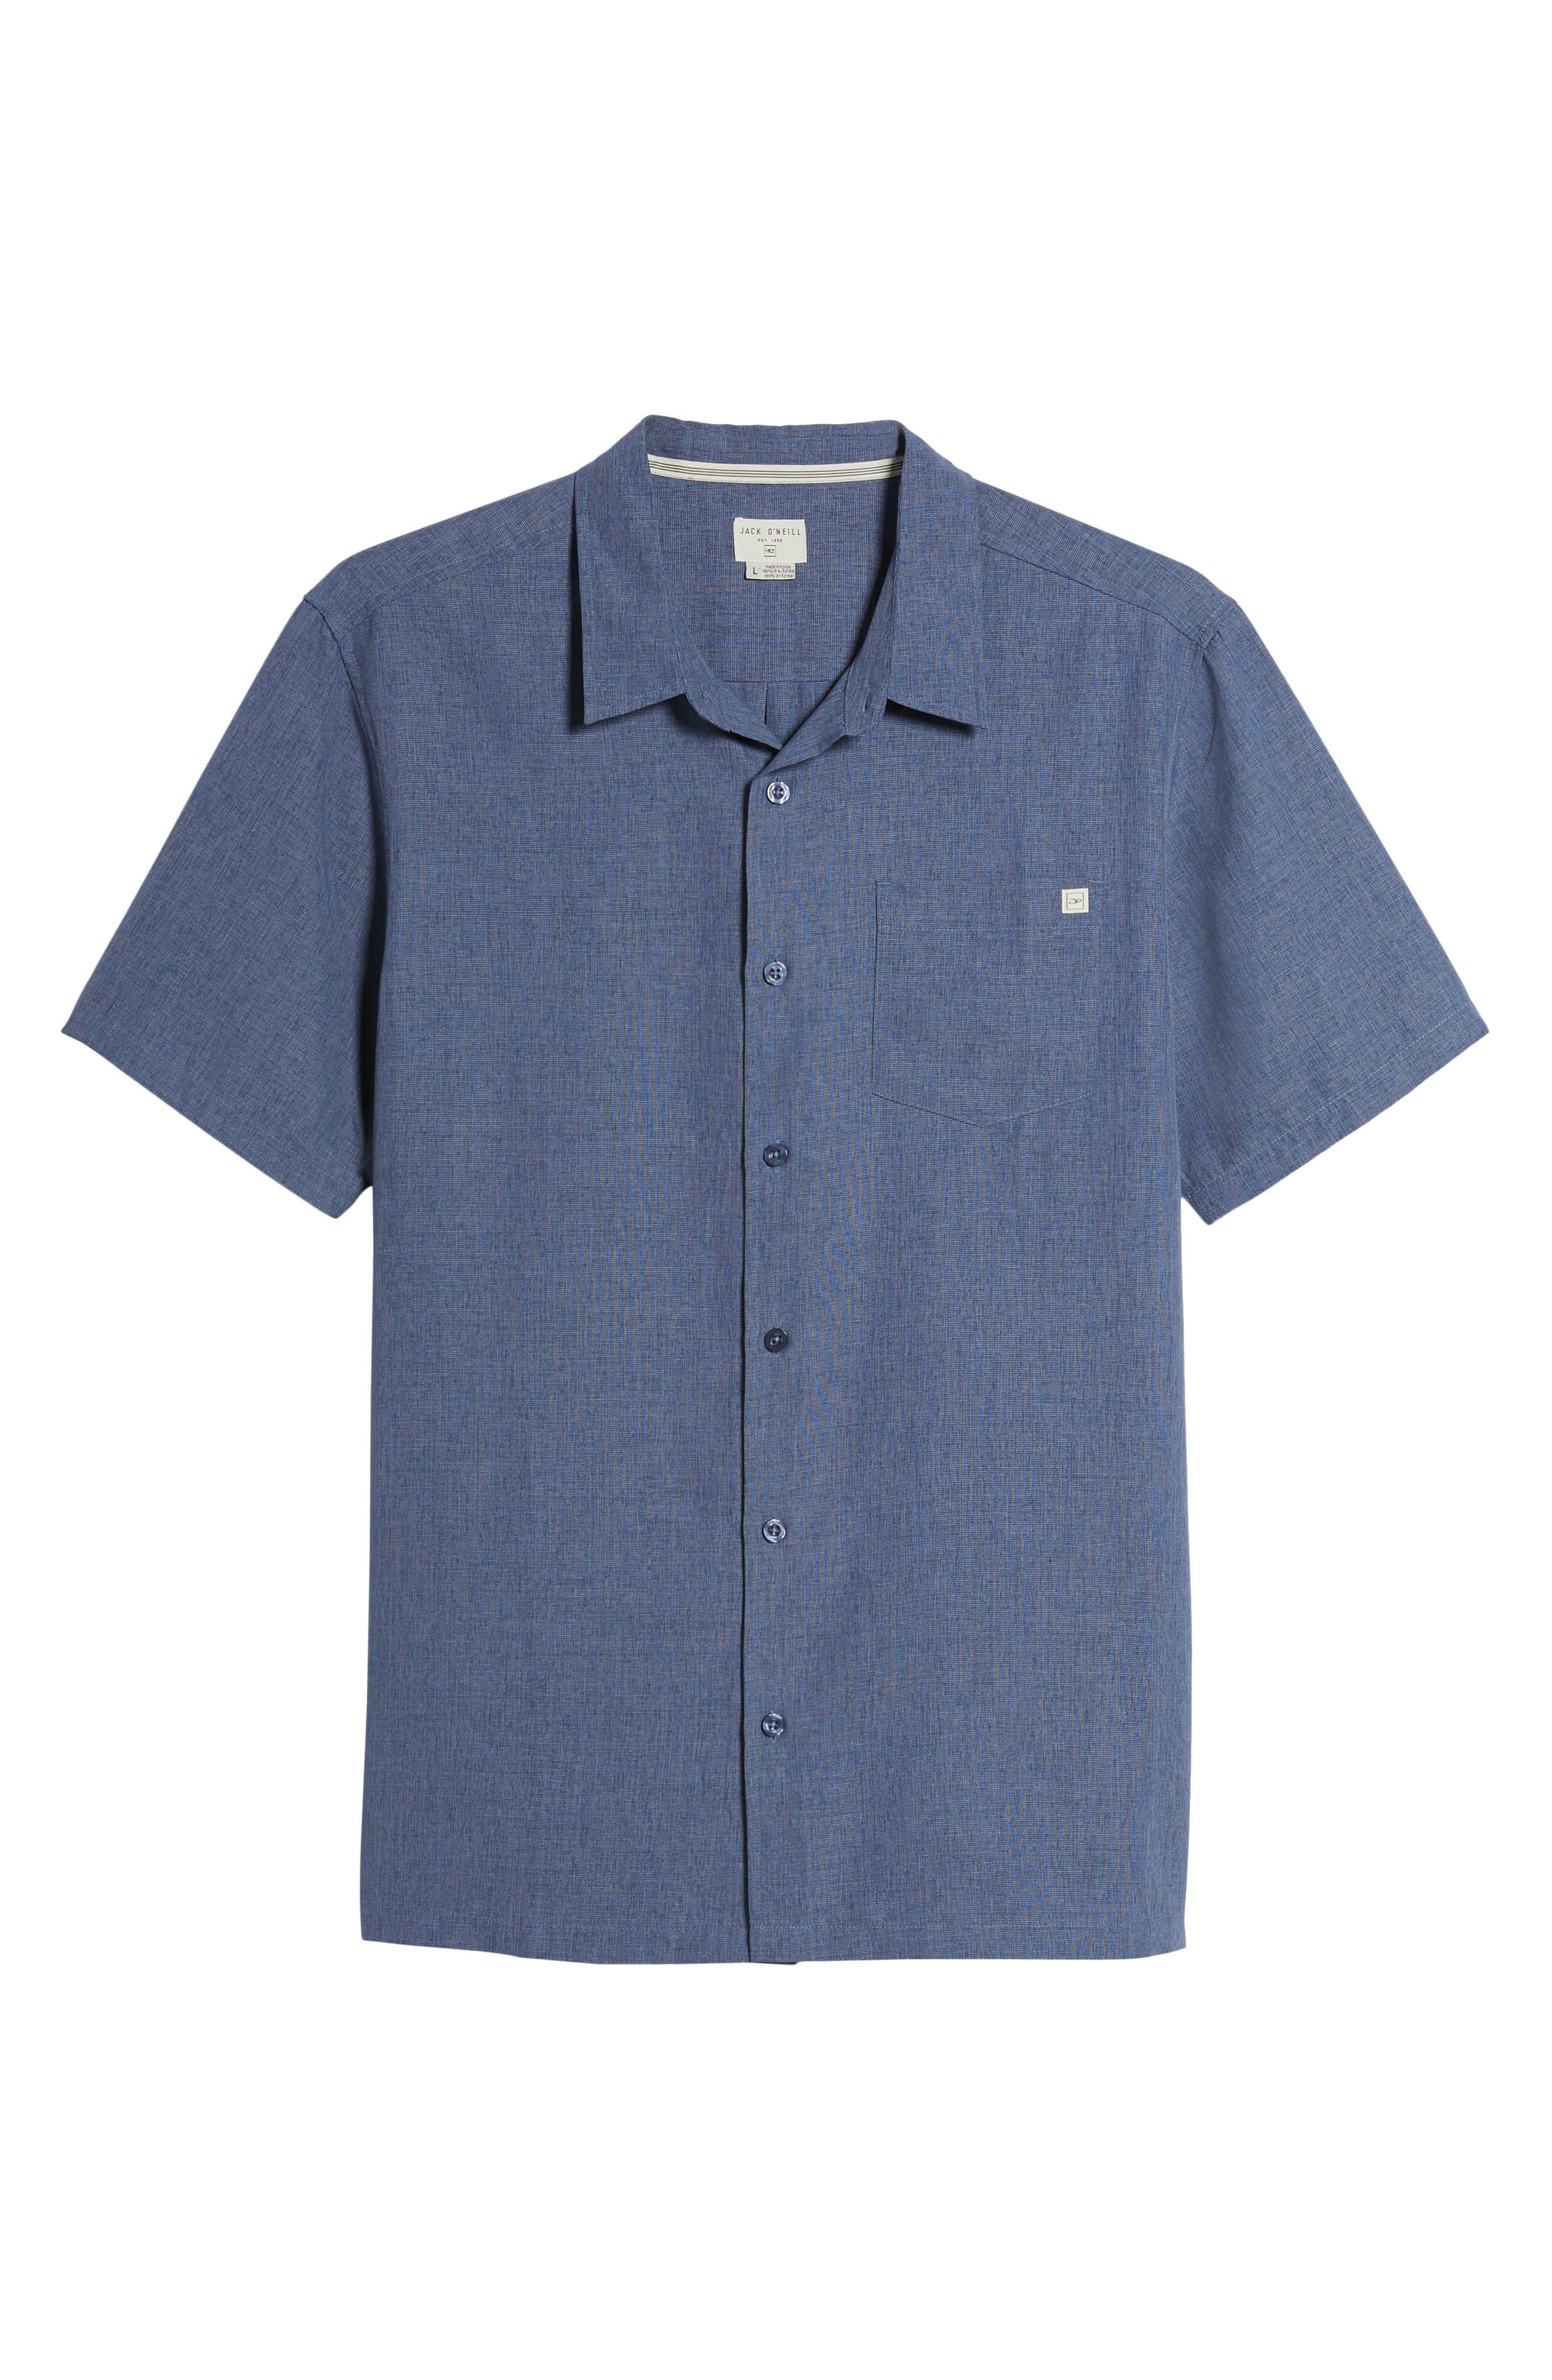 Liberty Regular Fit Short Sleeve Sport Shirt,                             Alternate thumbnail 6, color,                             NAVY